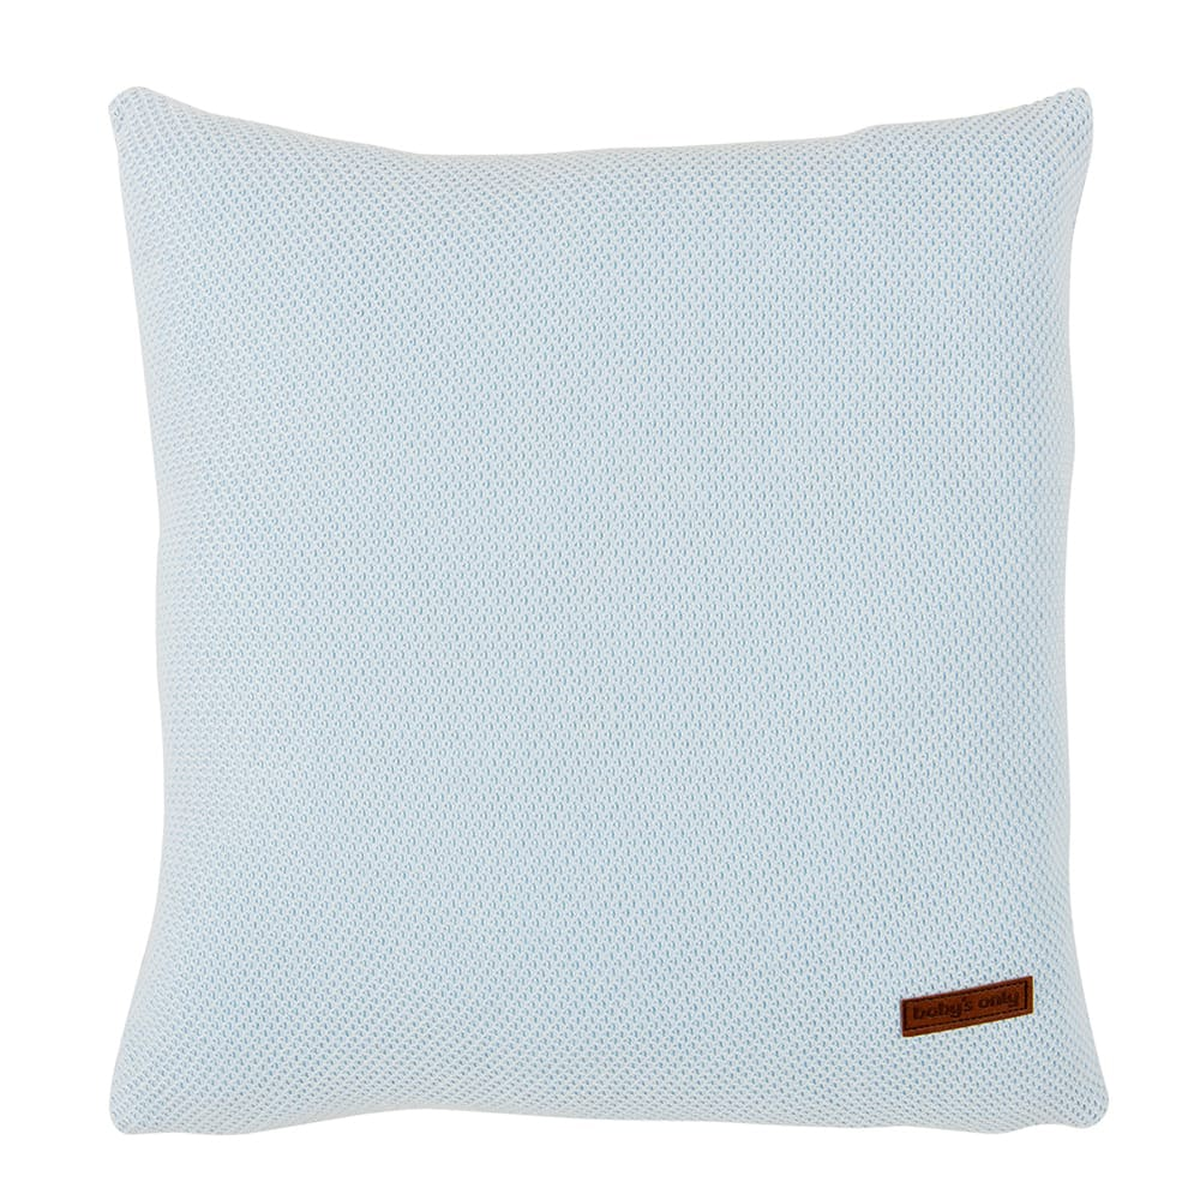 pillow classic powder blue 40x40